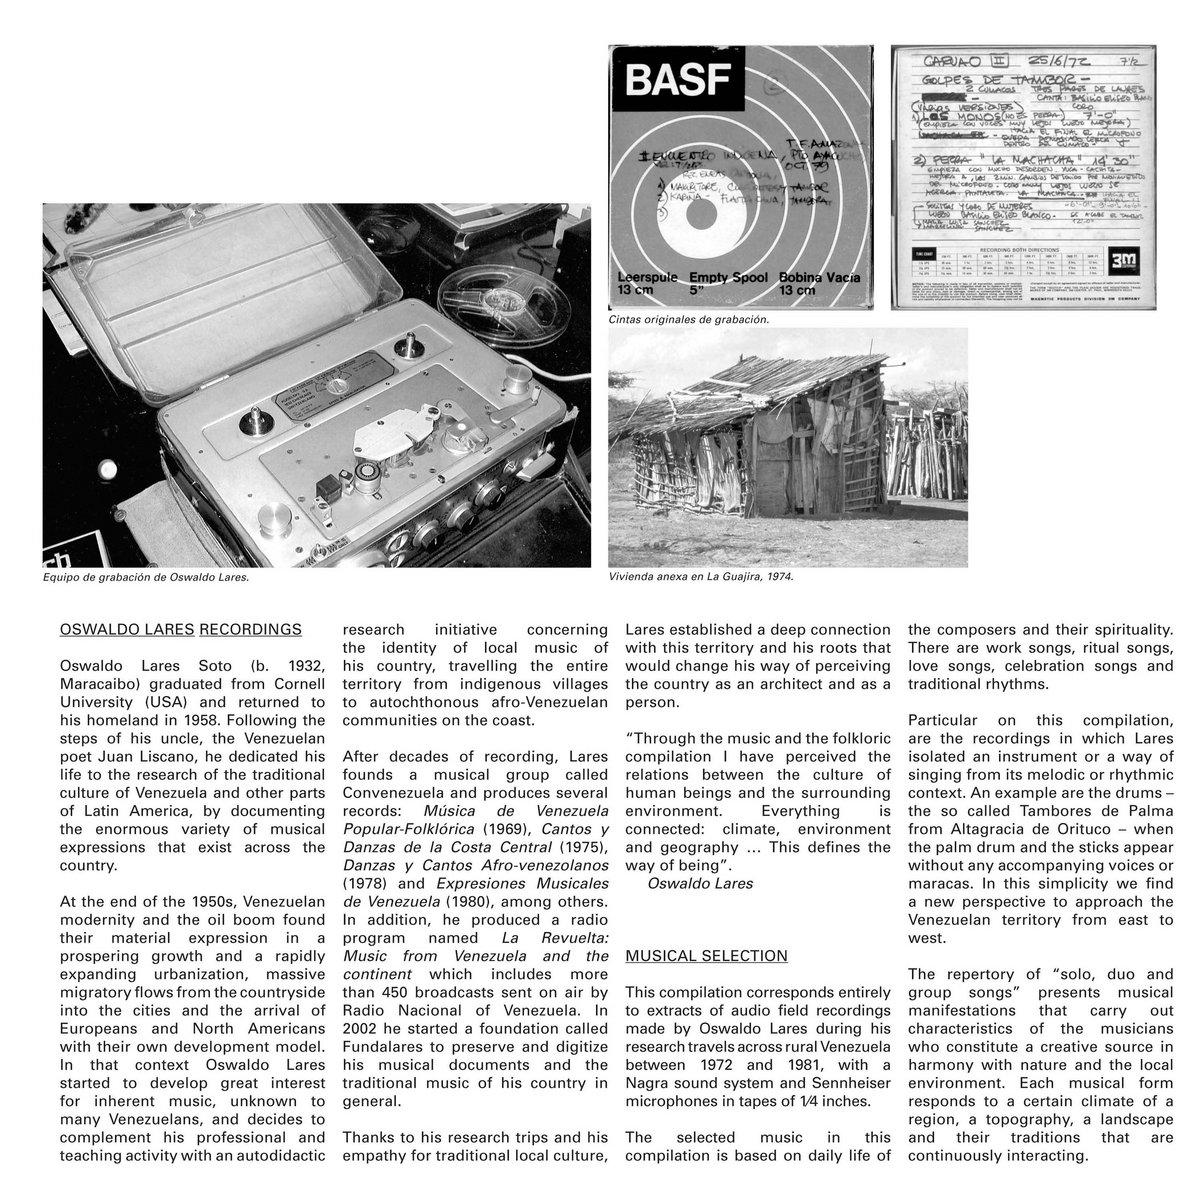 Taki Taki Rumba Mp3 Full Song Download: Musica De Venezuela 1972-81